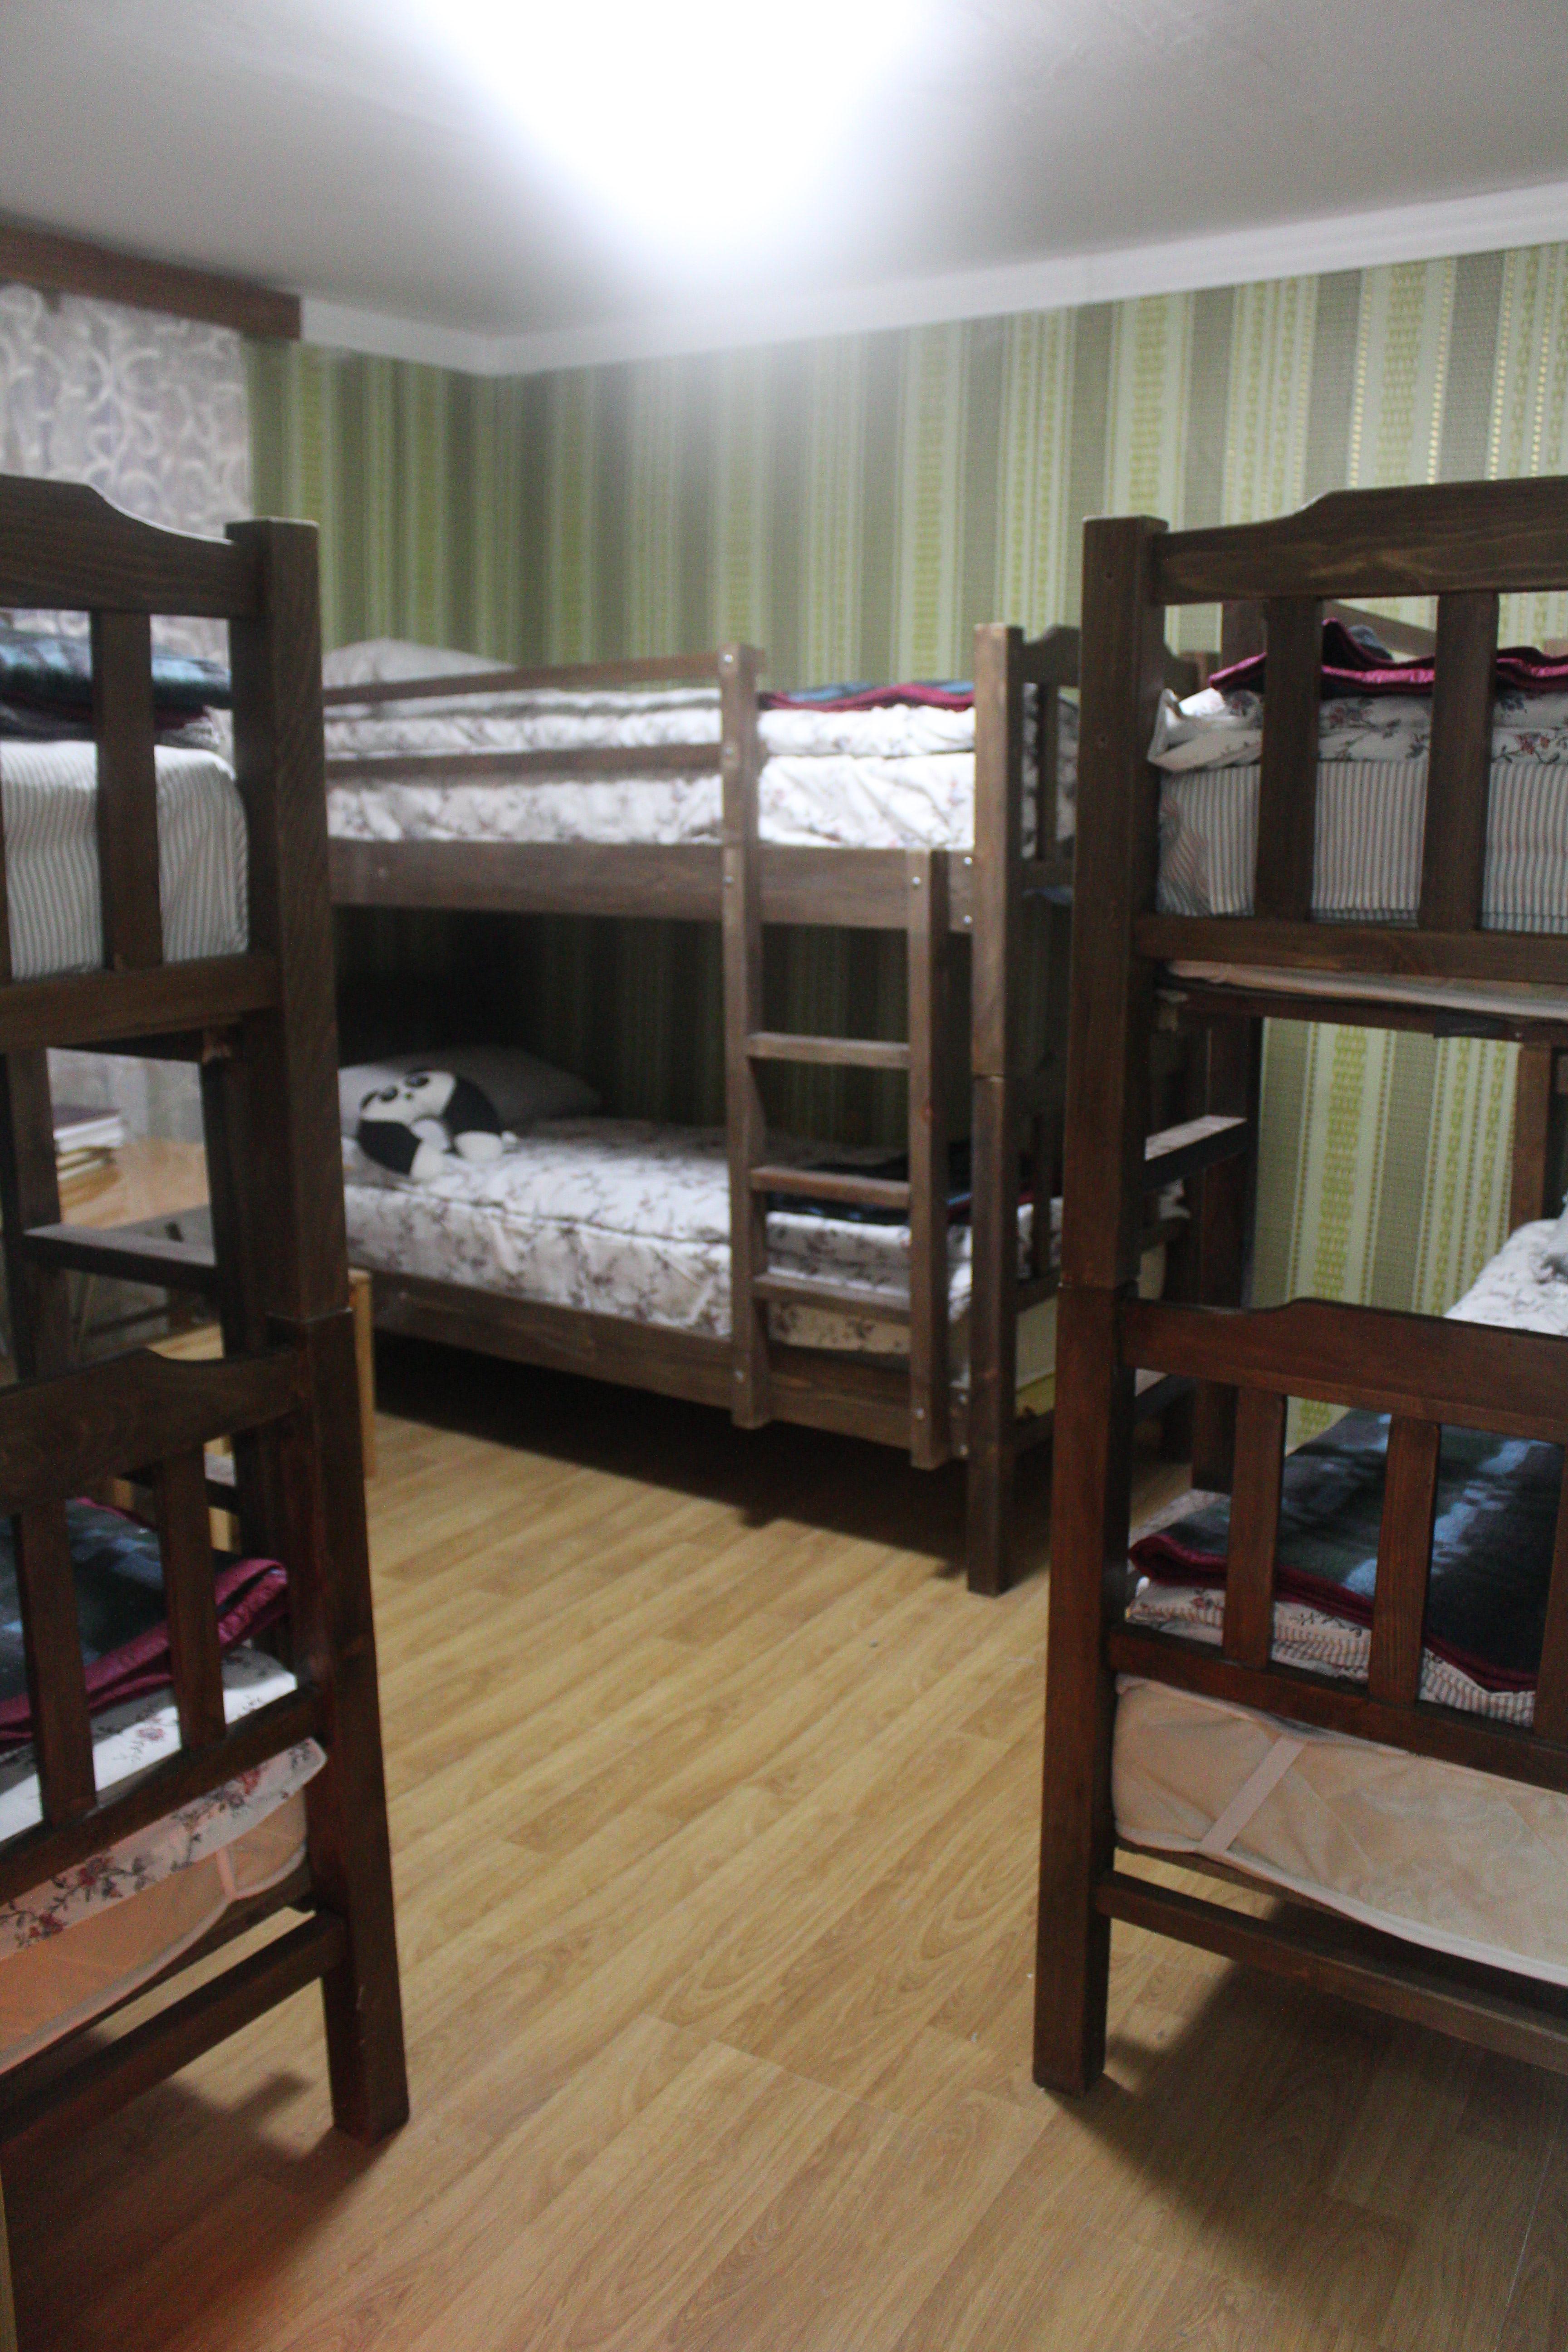 HOSTEL - Hostel Oxalis